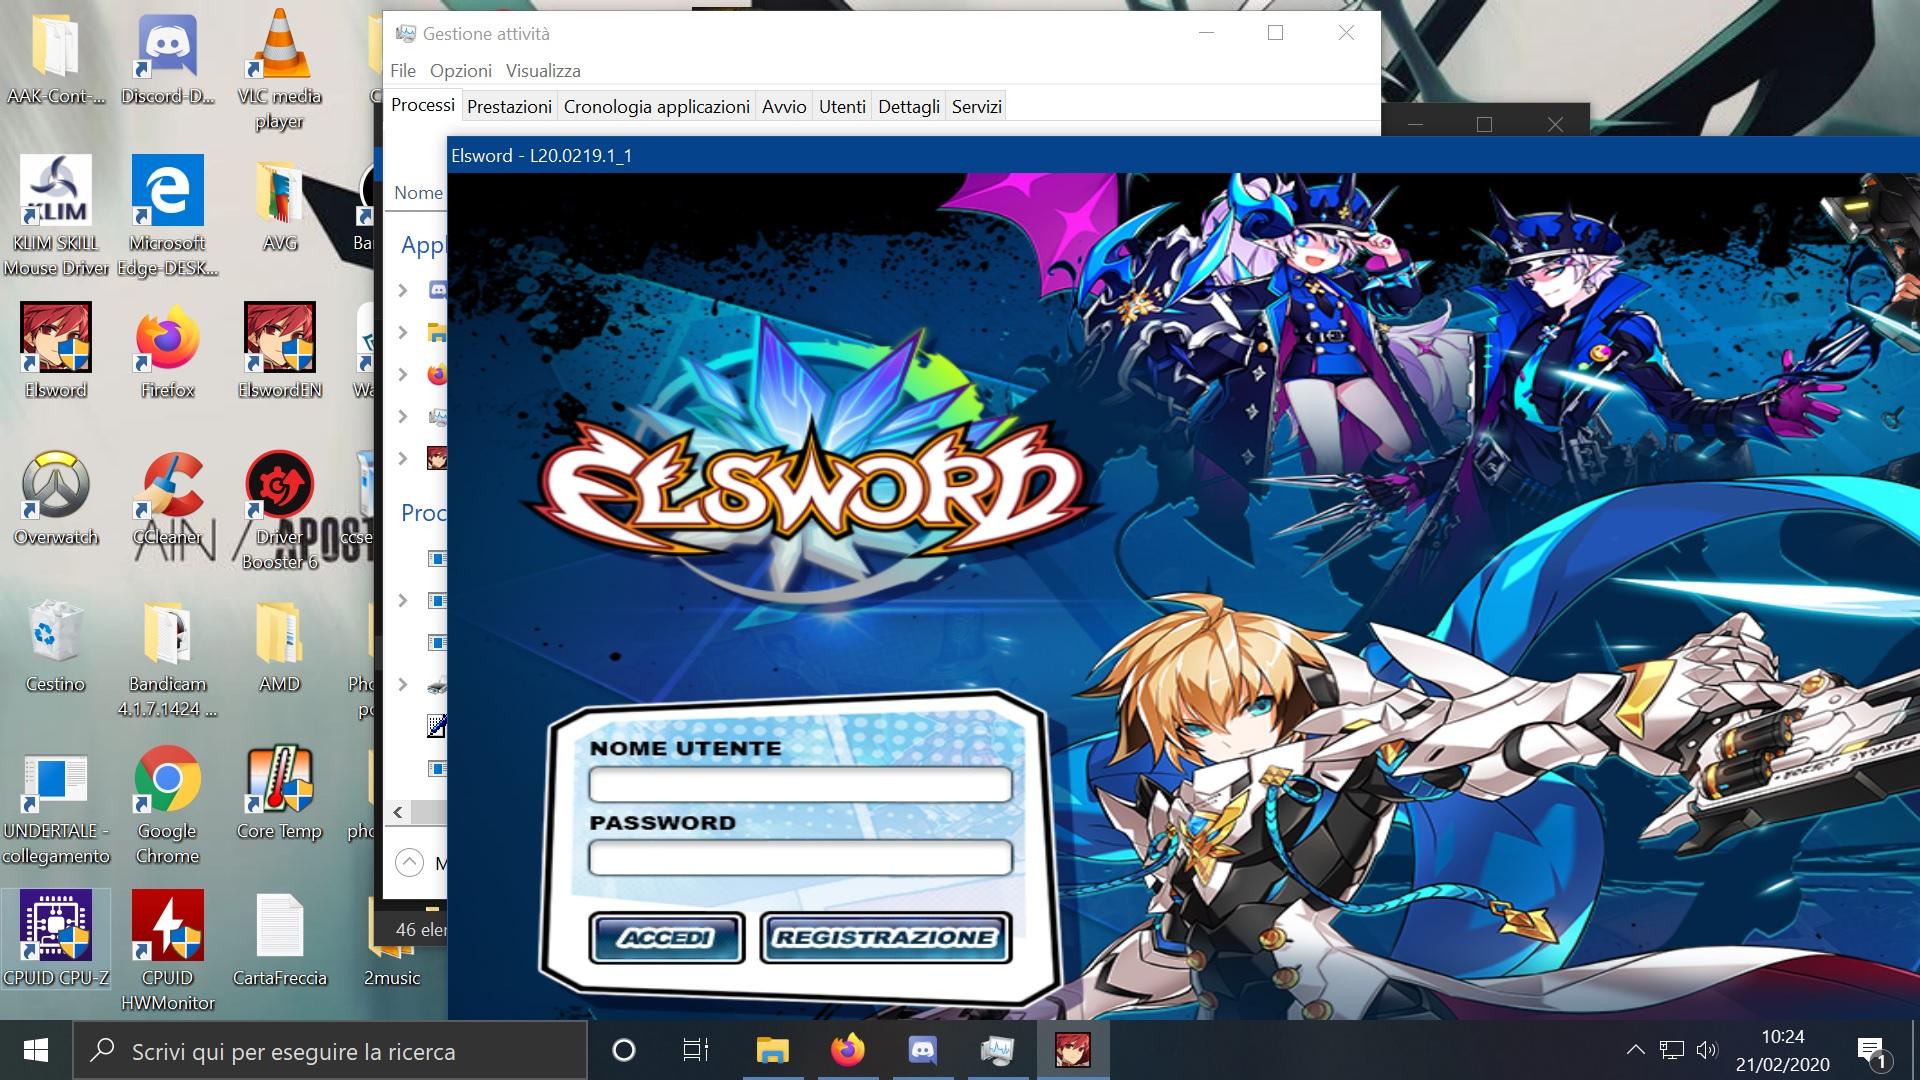 ebNv6uVQ_o.jpg